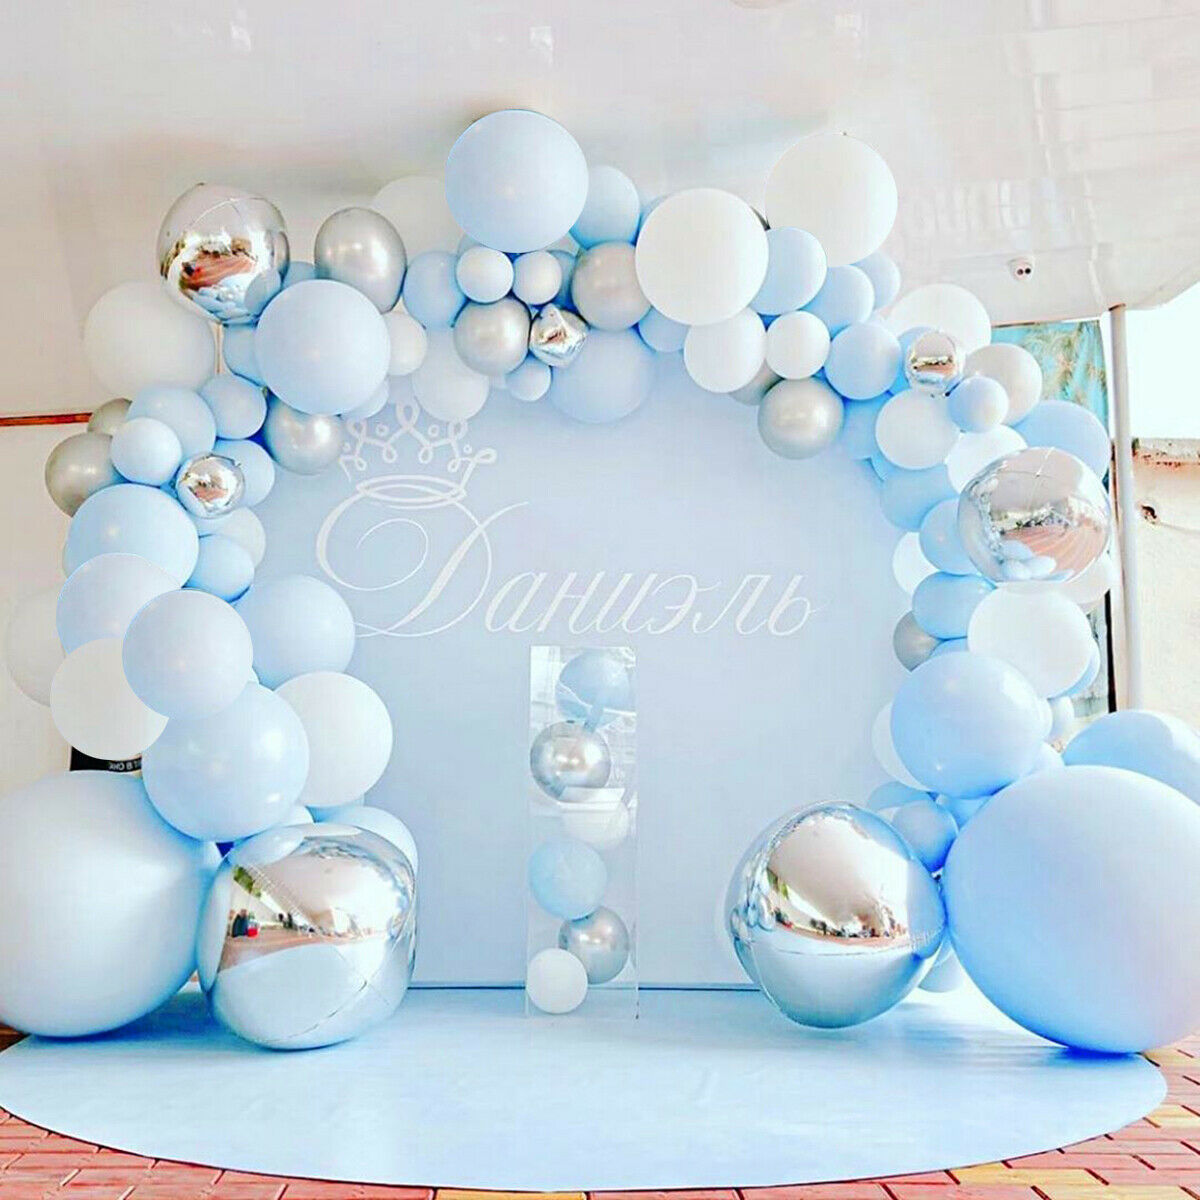 Macaron Pastel Balloon Garland Arch Kit Birthday Wedding Party Baby Shower Decor Ebay